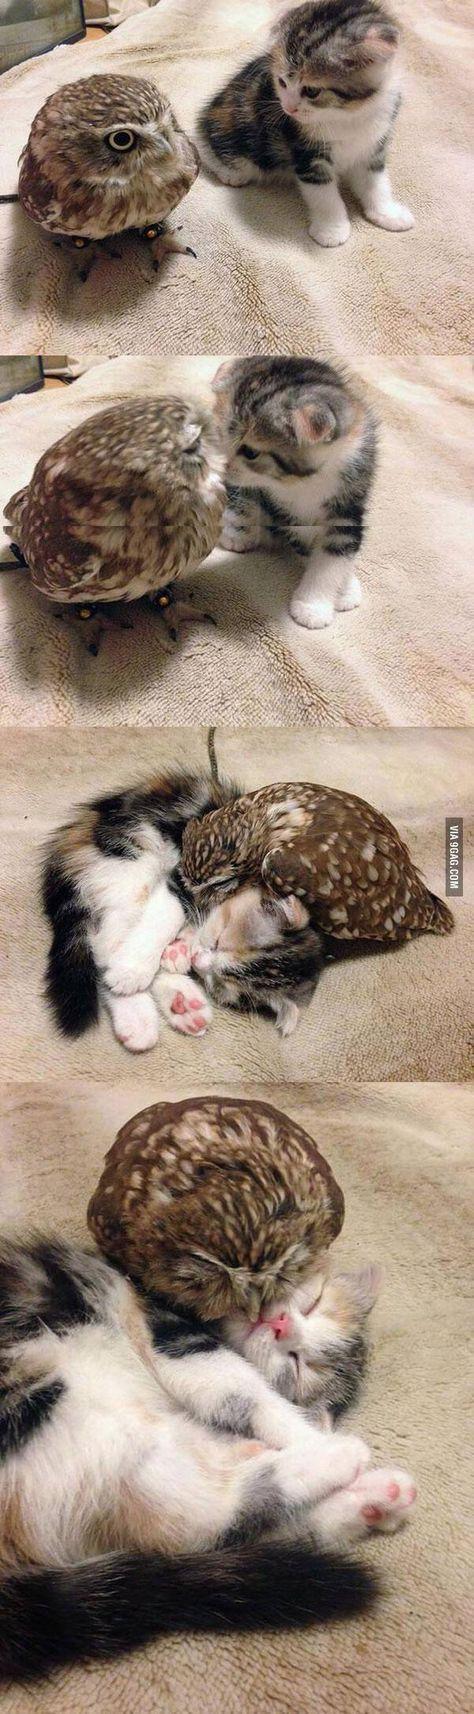 Tiny owl and tiny kitten - www.viralpx.com | www.facebook.com/viralpx